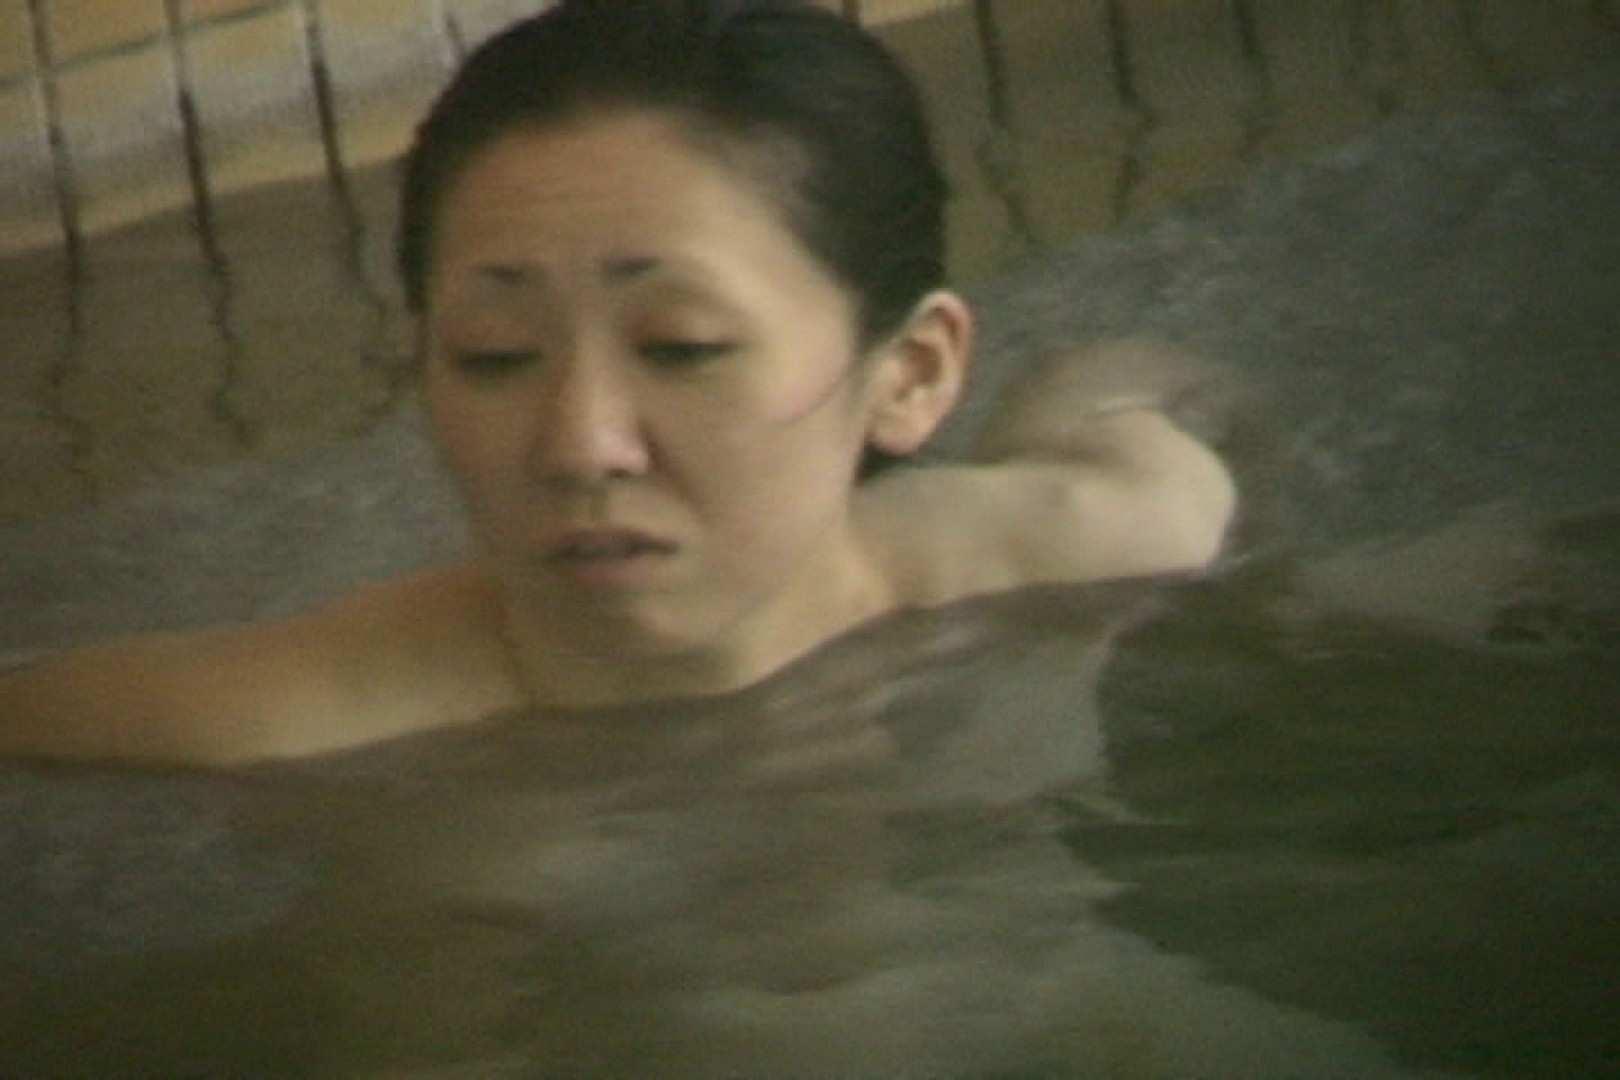 Aquaな露天風呂Vol.449 盗撮 | HなOL  101pic 18